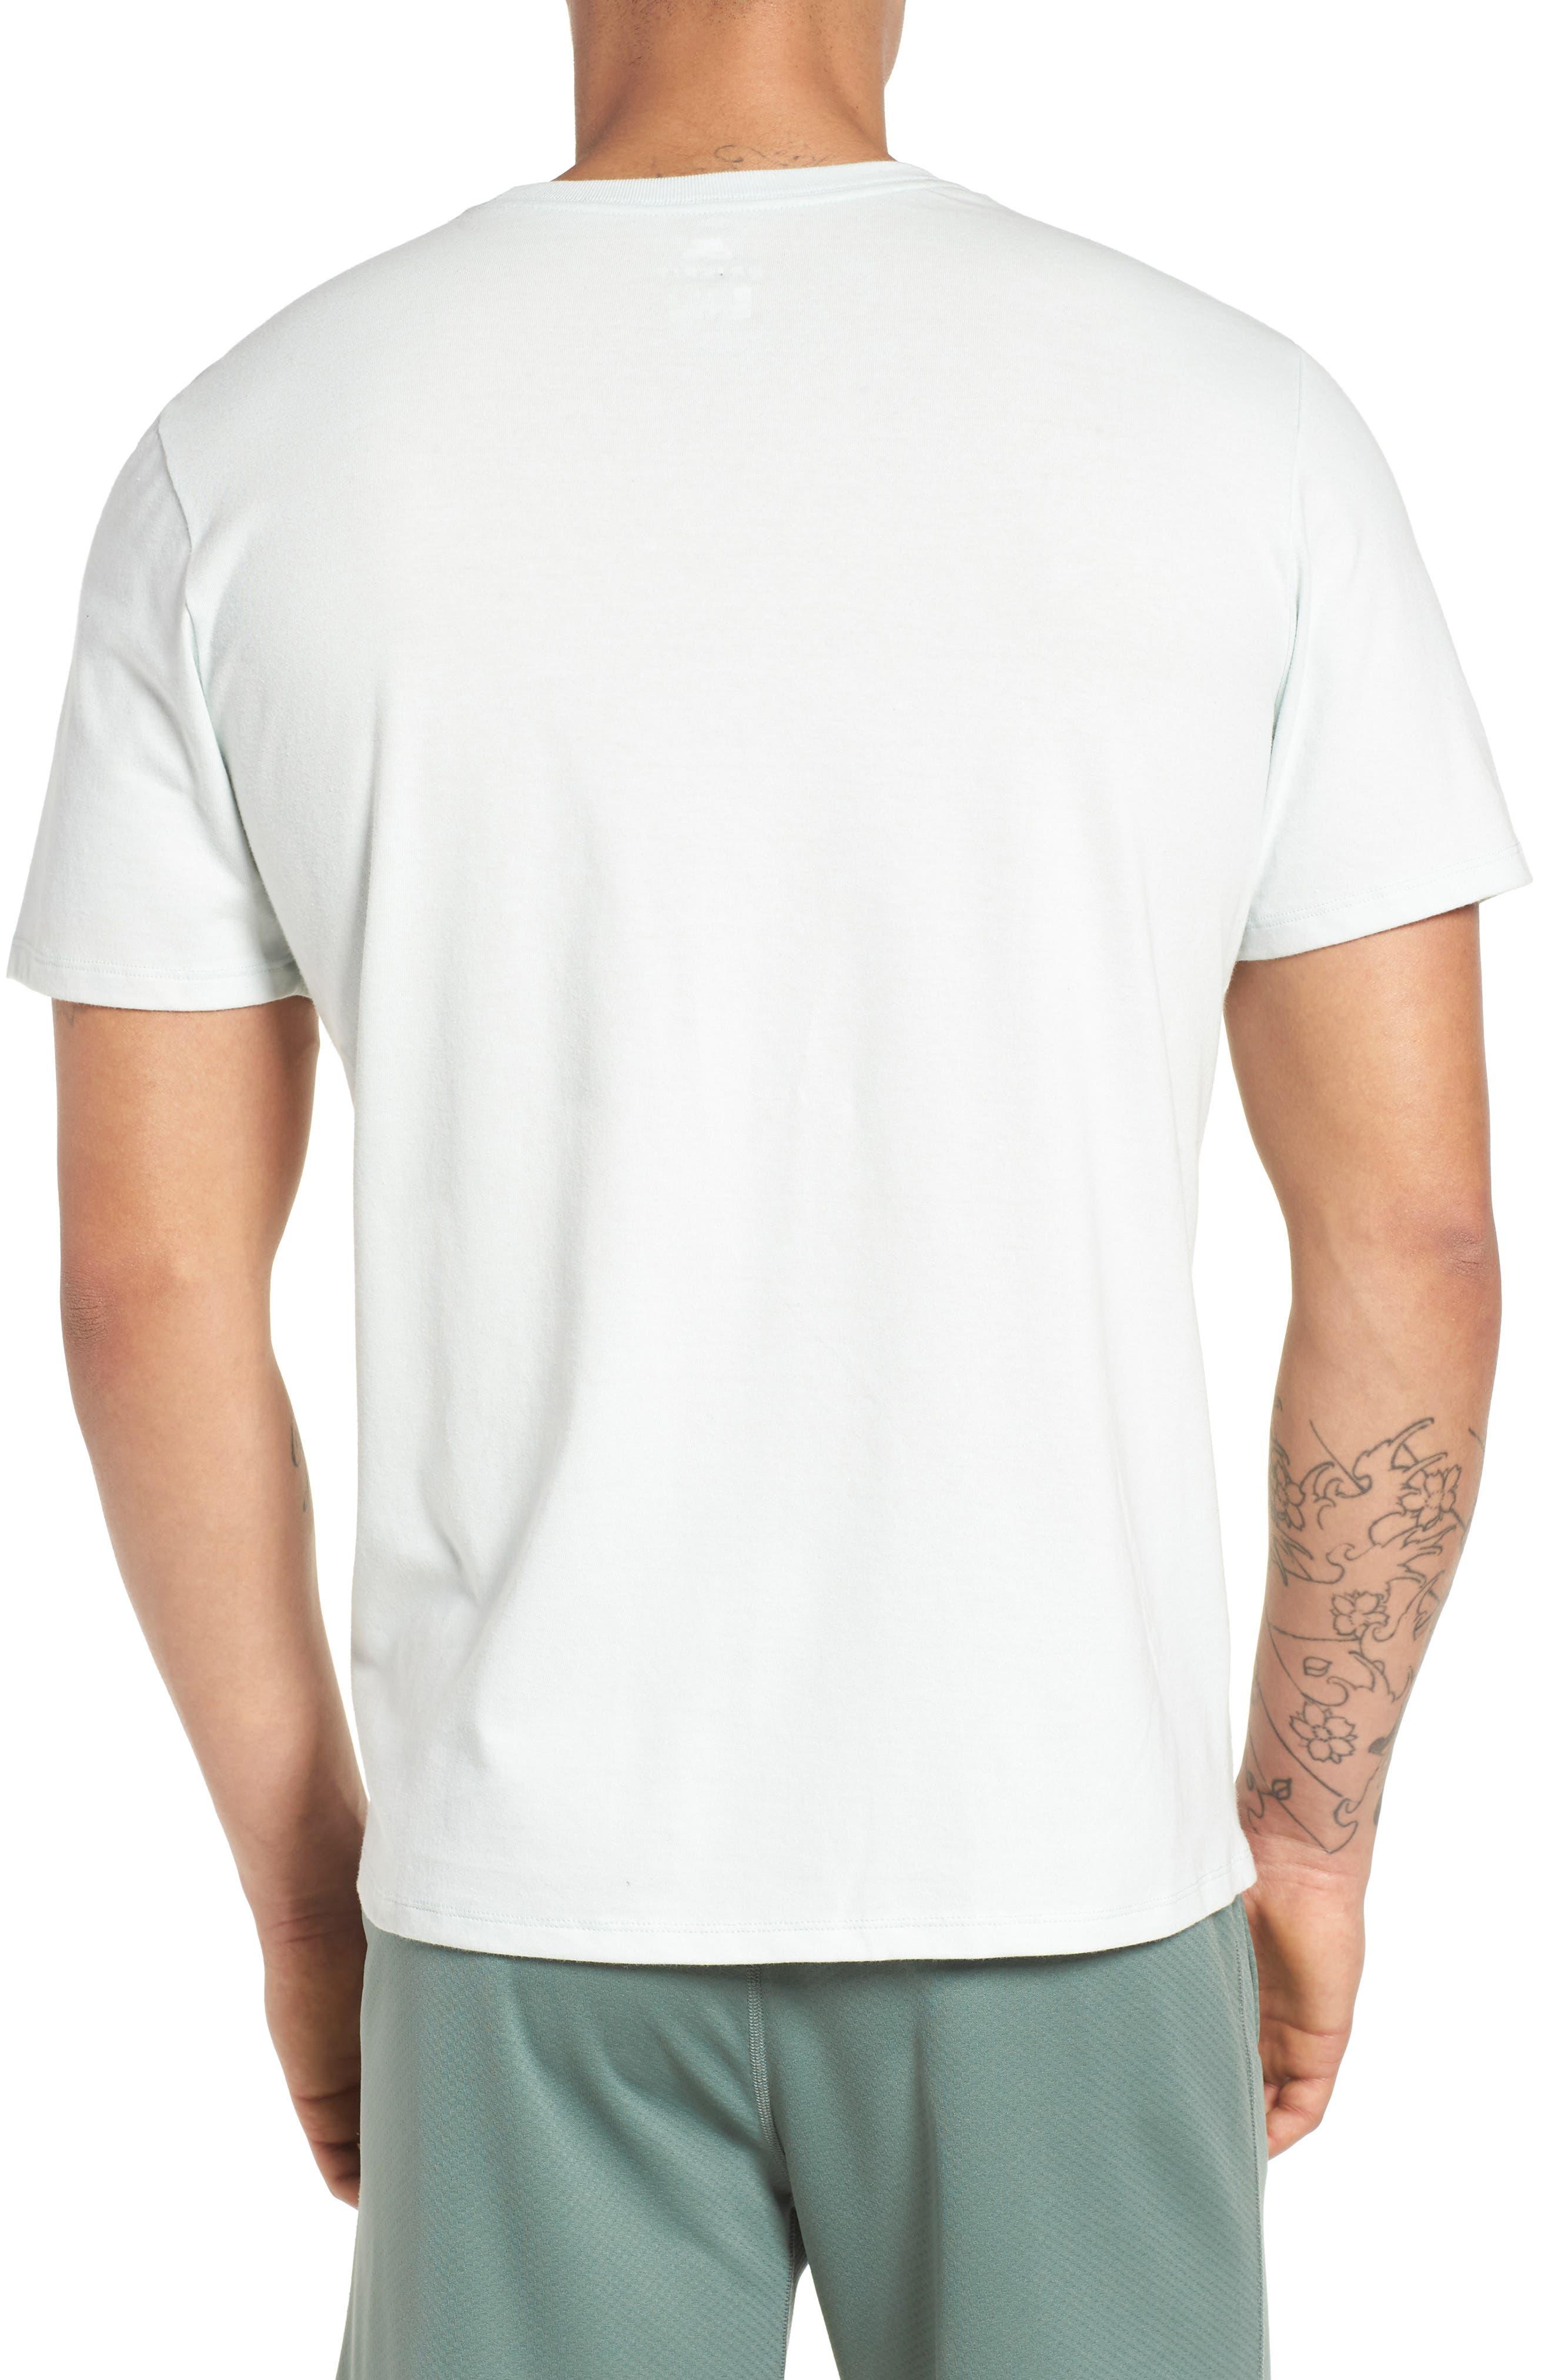 SB Dry BBQ Fish Crewneck T-Shirt,                             Alternate thumbnail 2, color,